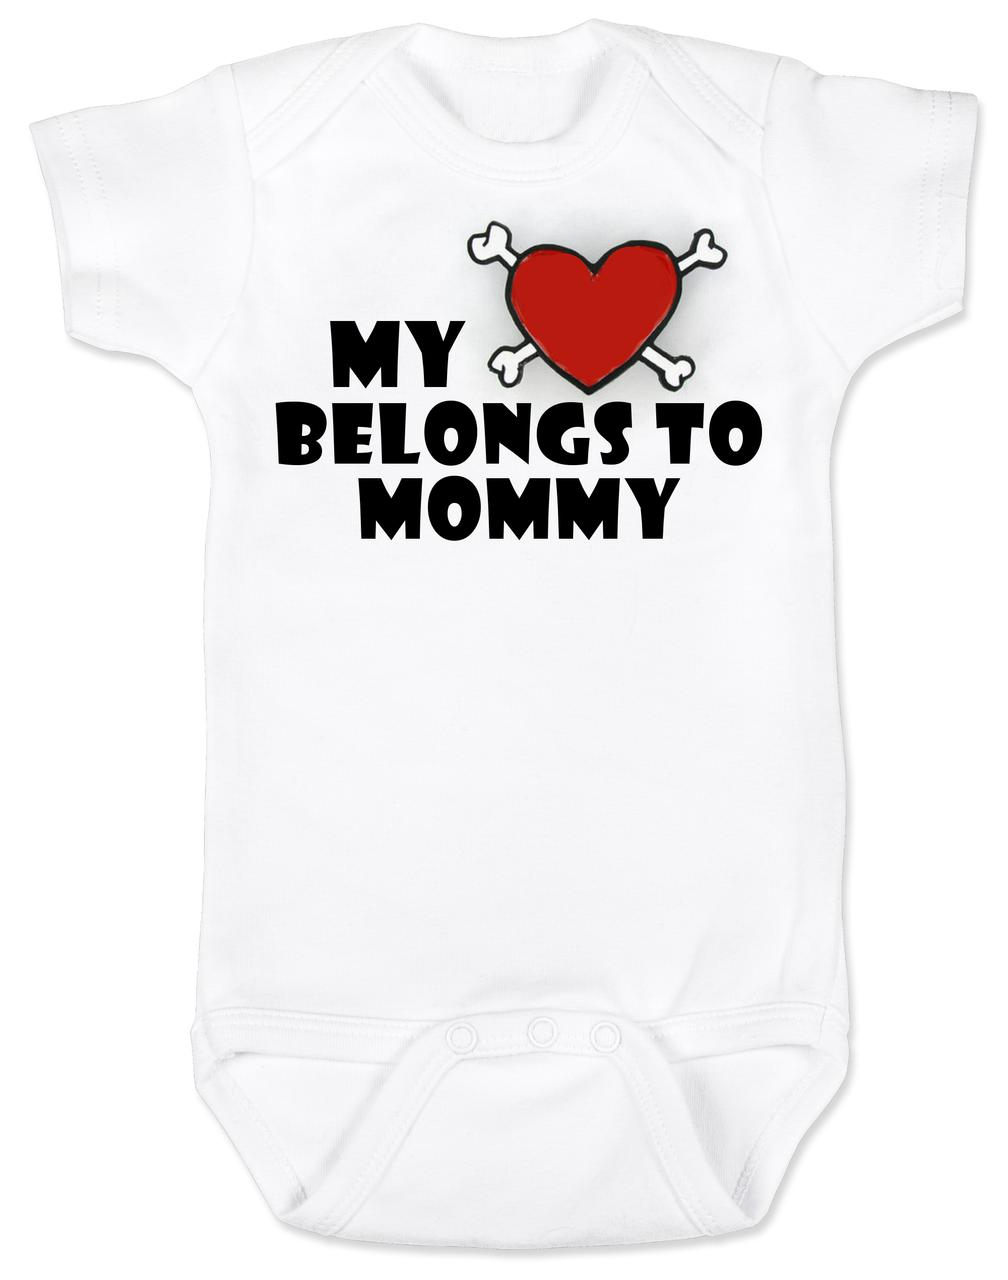 769b0451 My heart belongs to Mommy Bodysuit, I love my mommy infant bodysuit, My  mommy